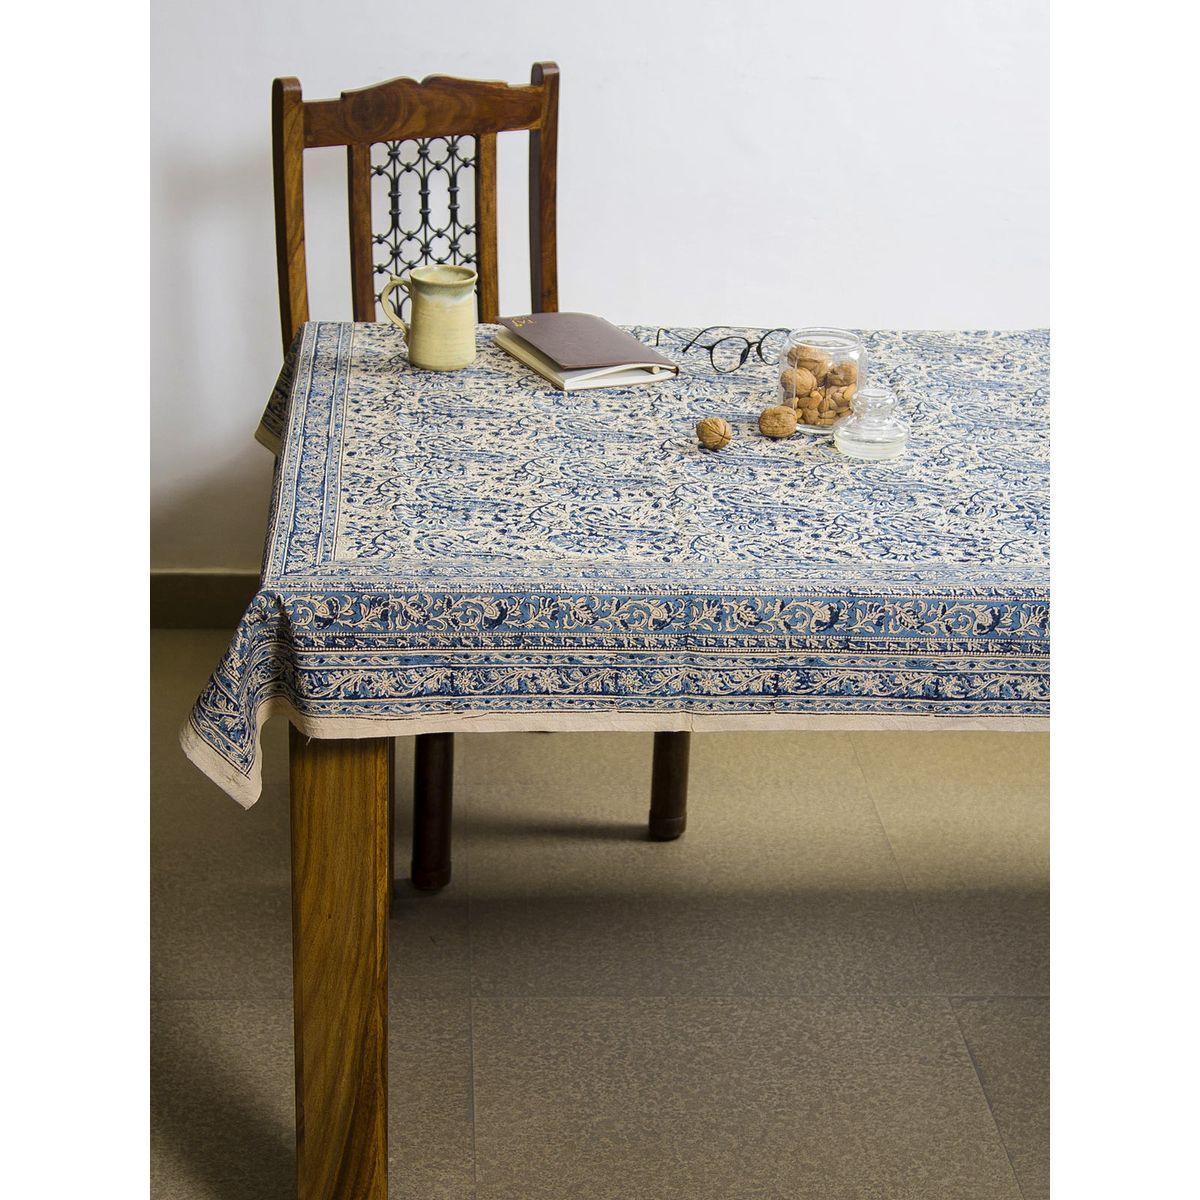 Cerulean Amra Kalamkari 6 seater table cover